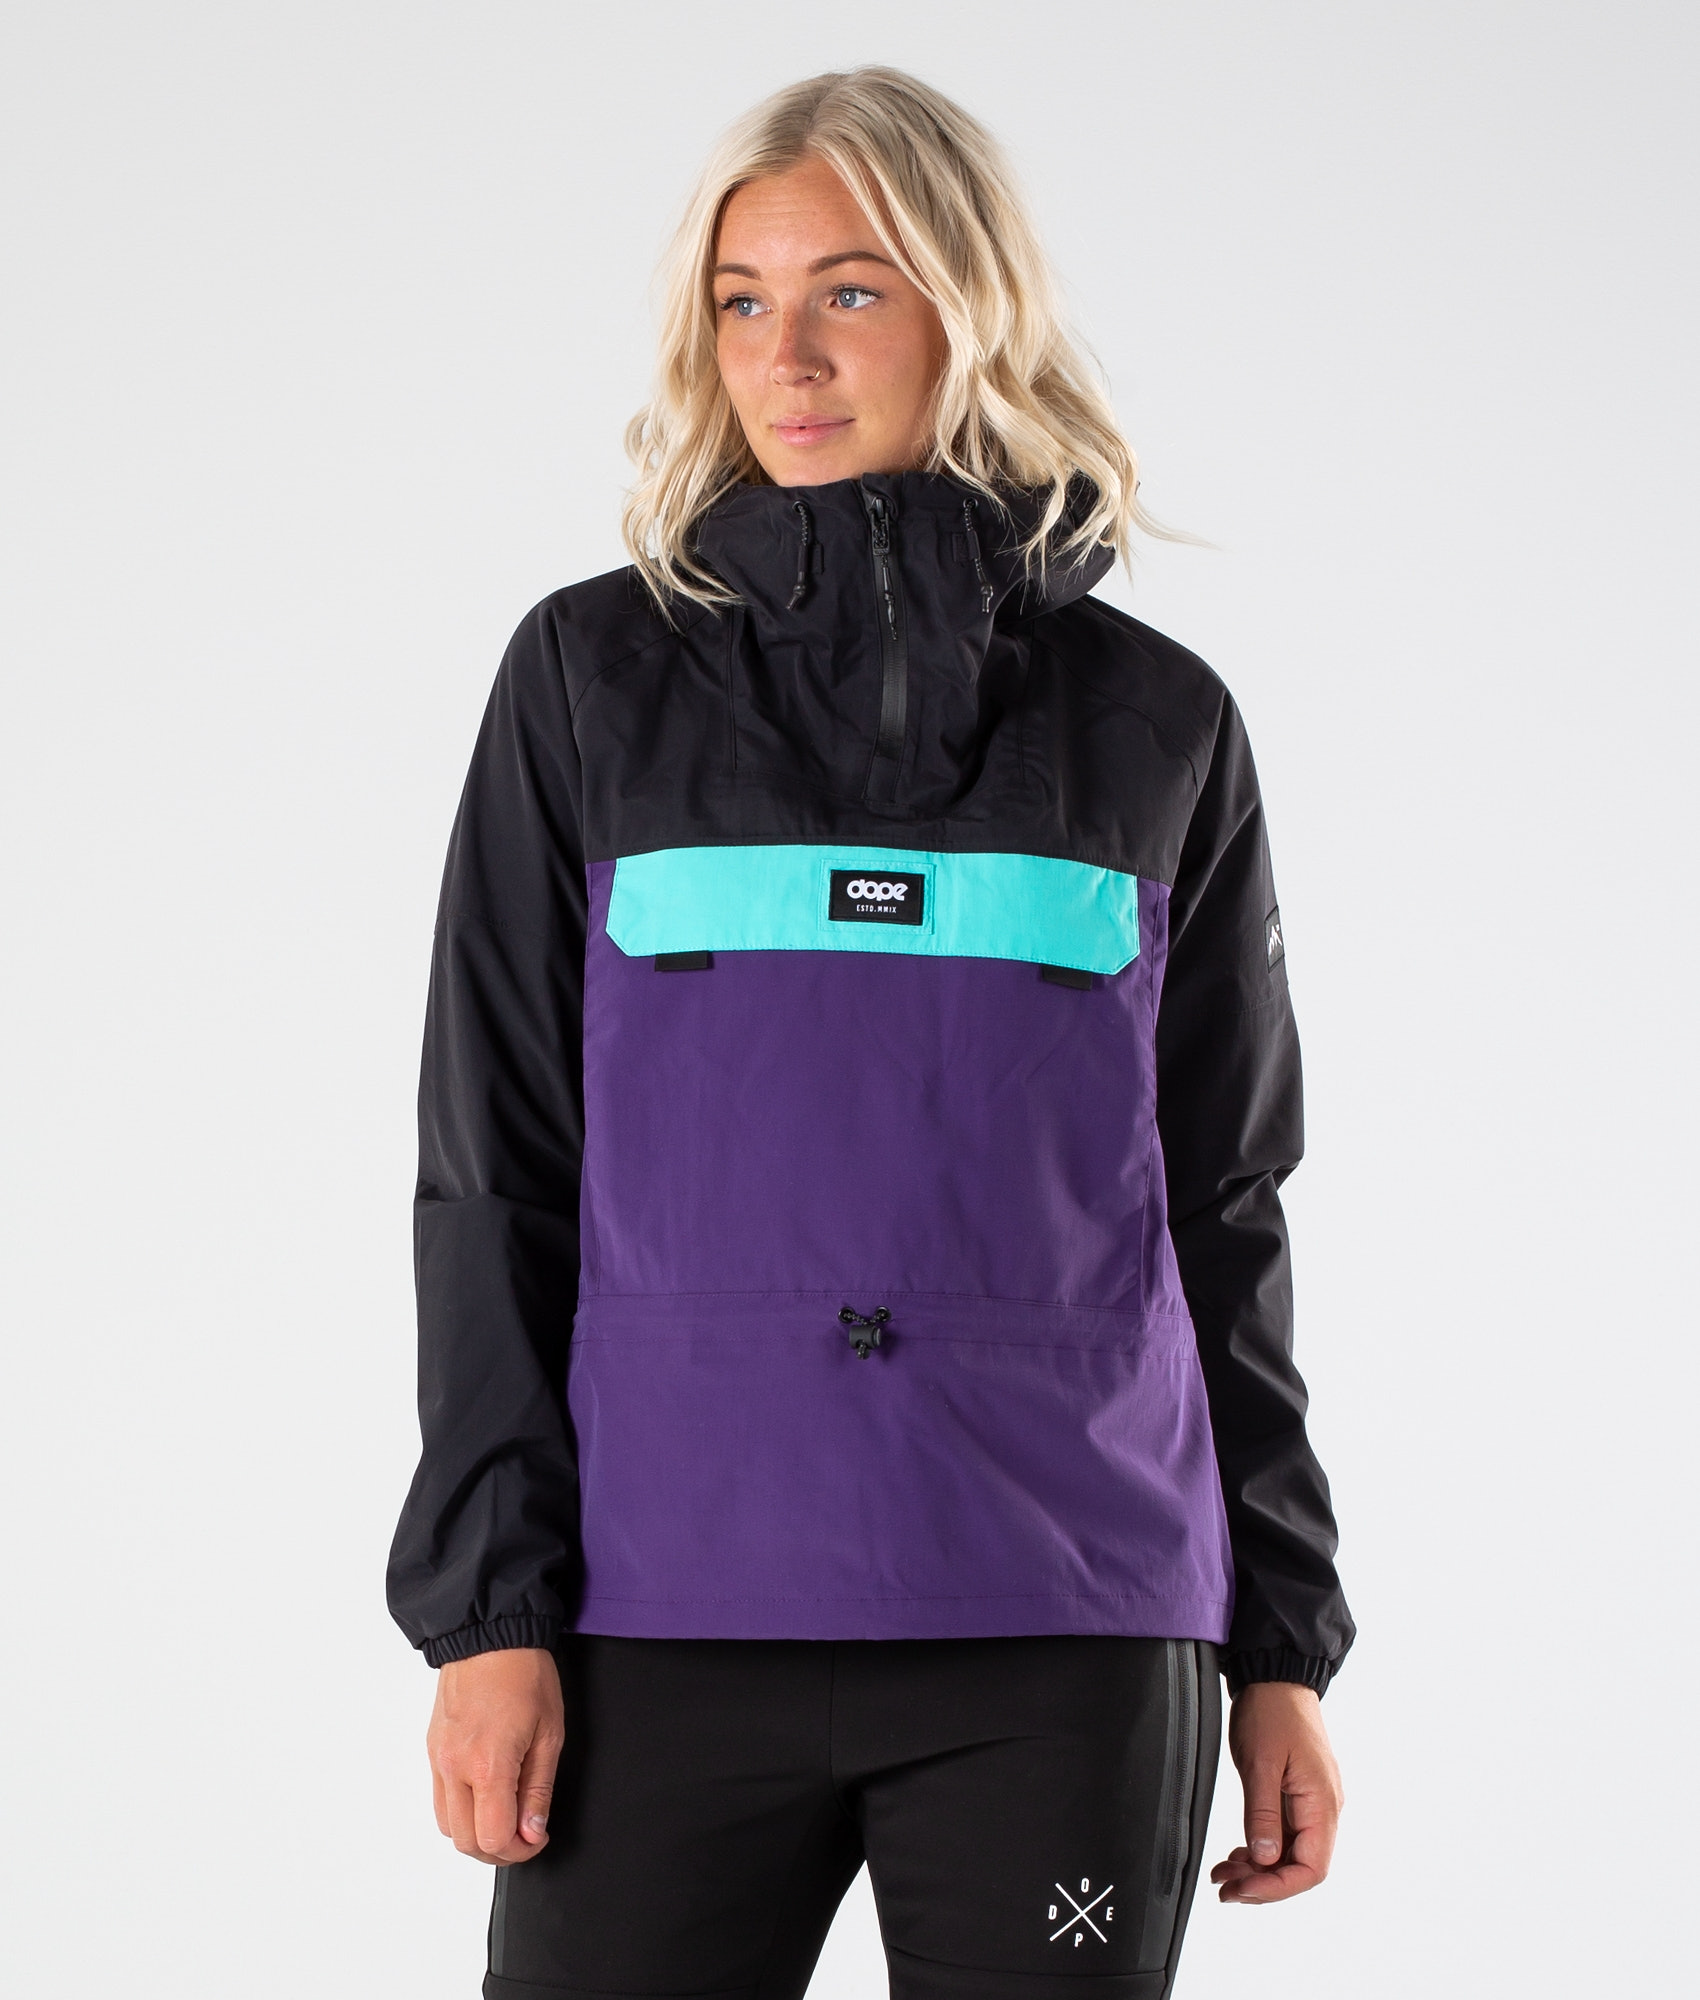 c25700d92 Dope Snow Online Kaufen (Snow, Skate, Streetwear)   Ridestore.de